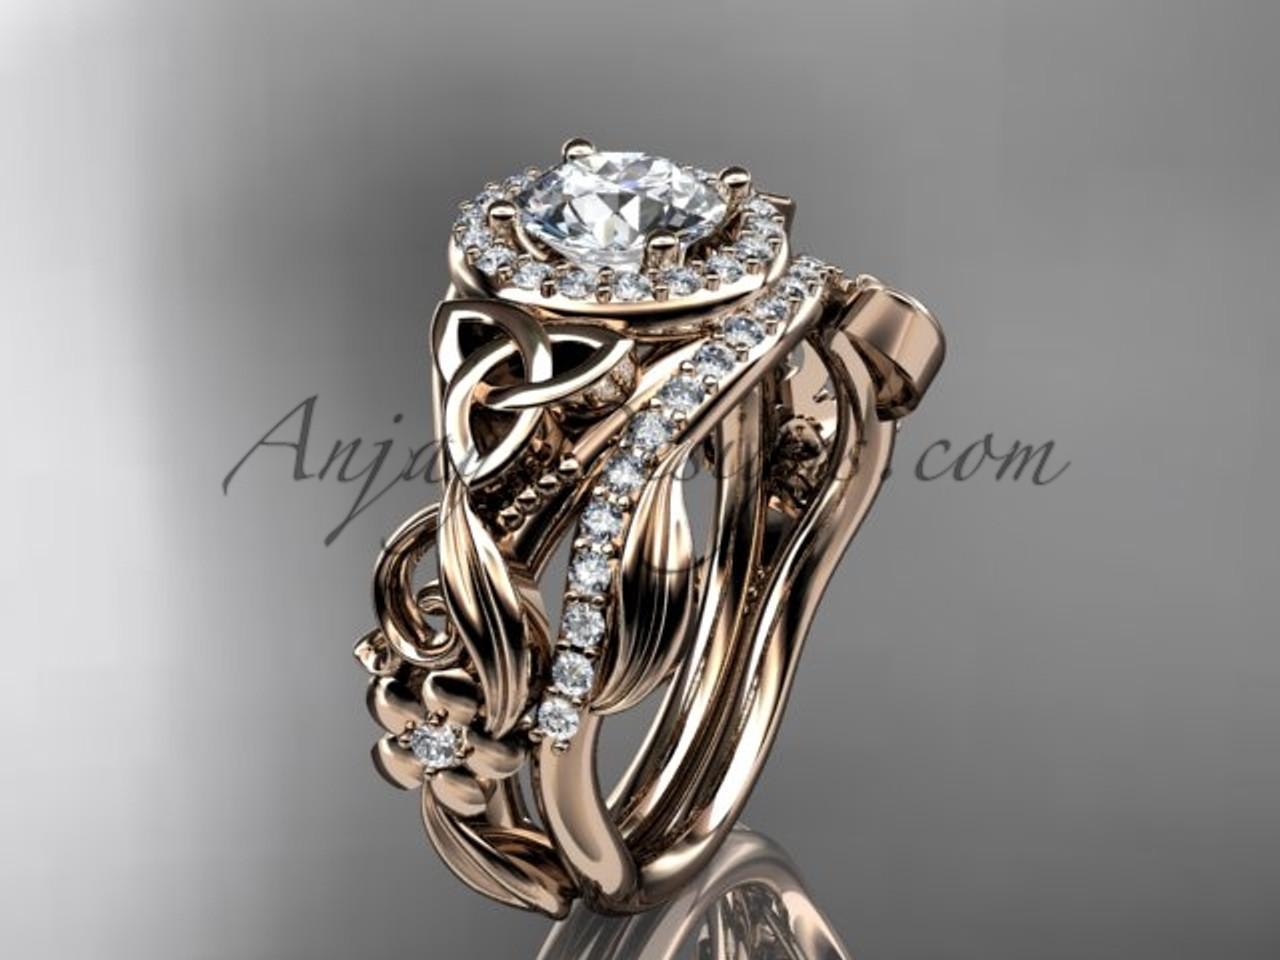 Celtic Wedding Ring Sets Rose Gold Diamond Ring Ct7300s